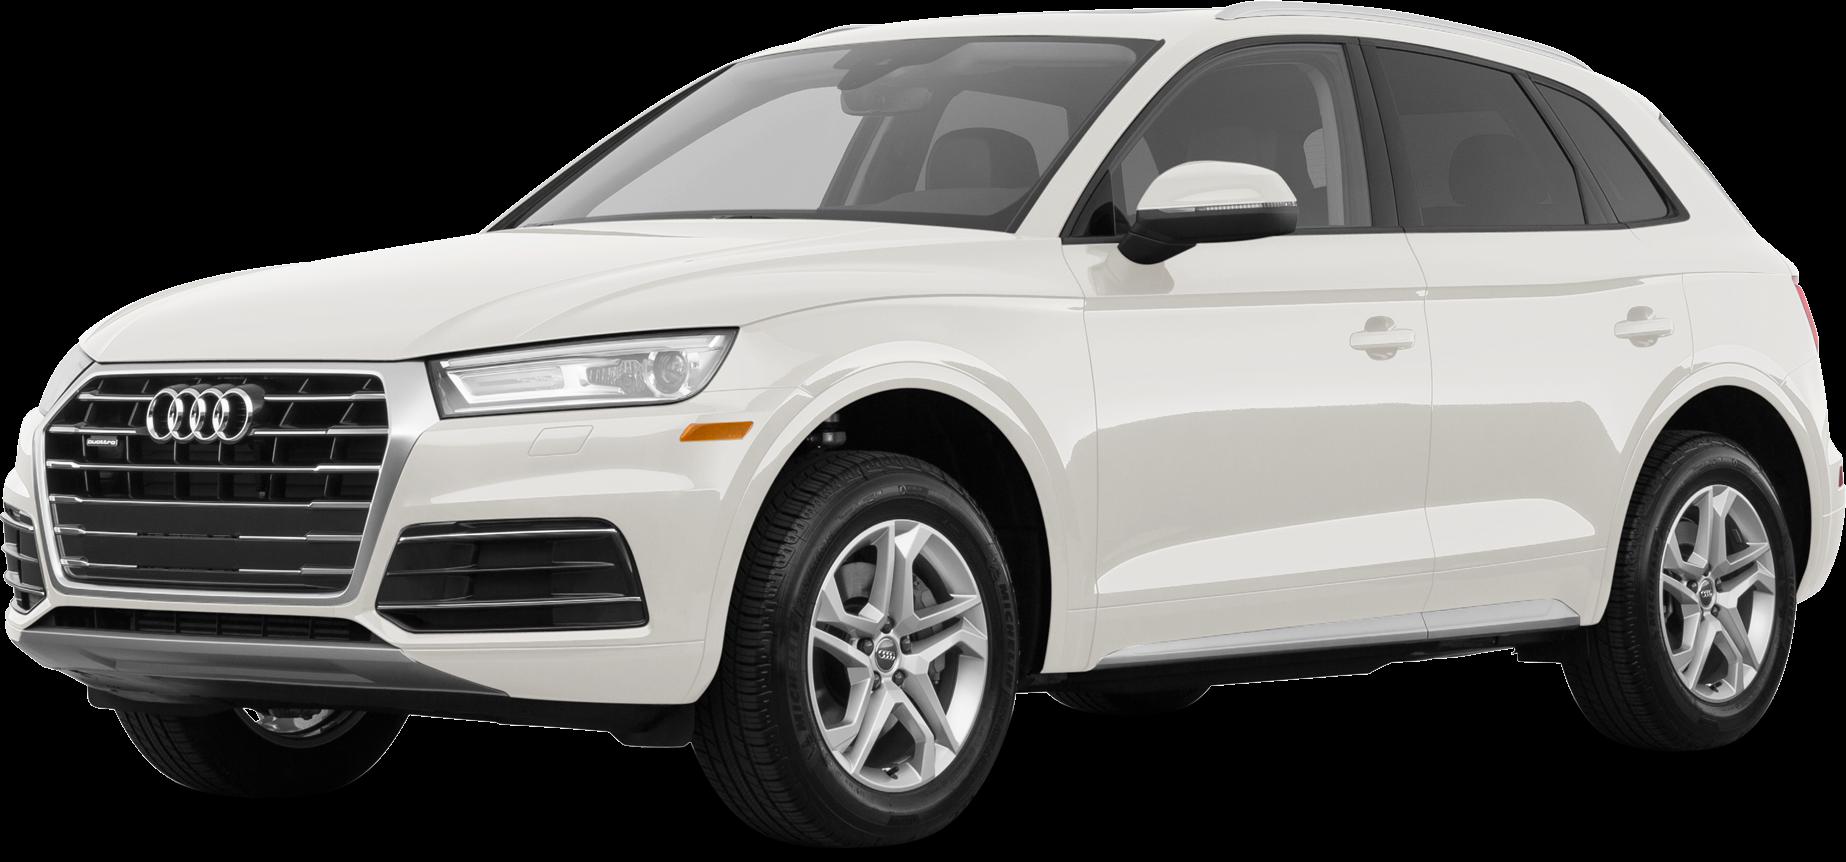 2018 Audi Q5 Values Cars For Sale Kelley Blue Book